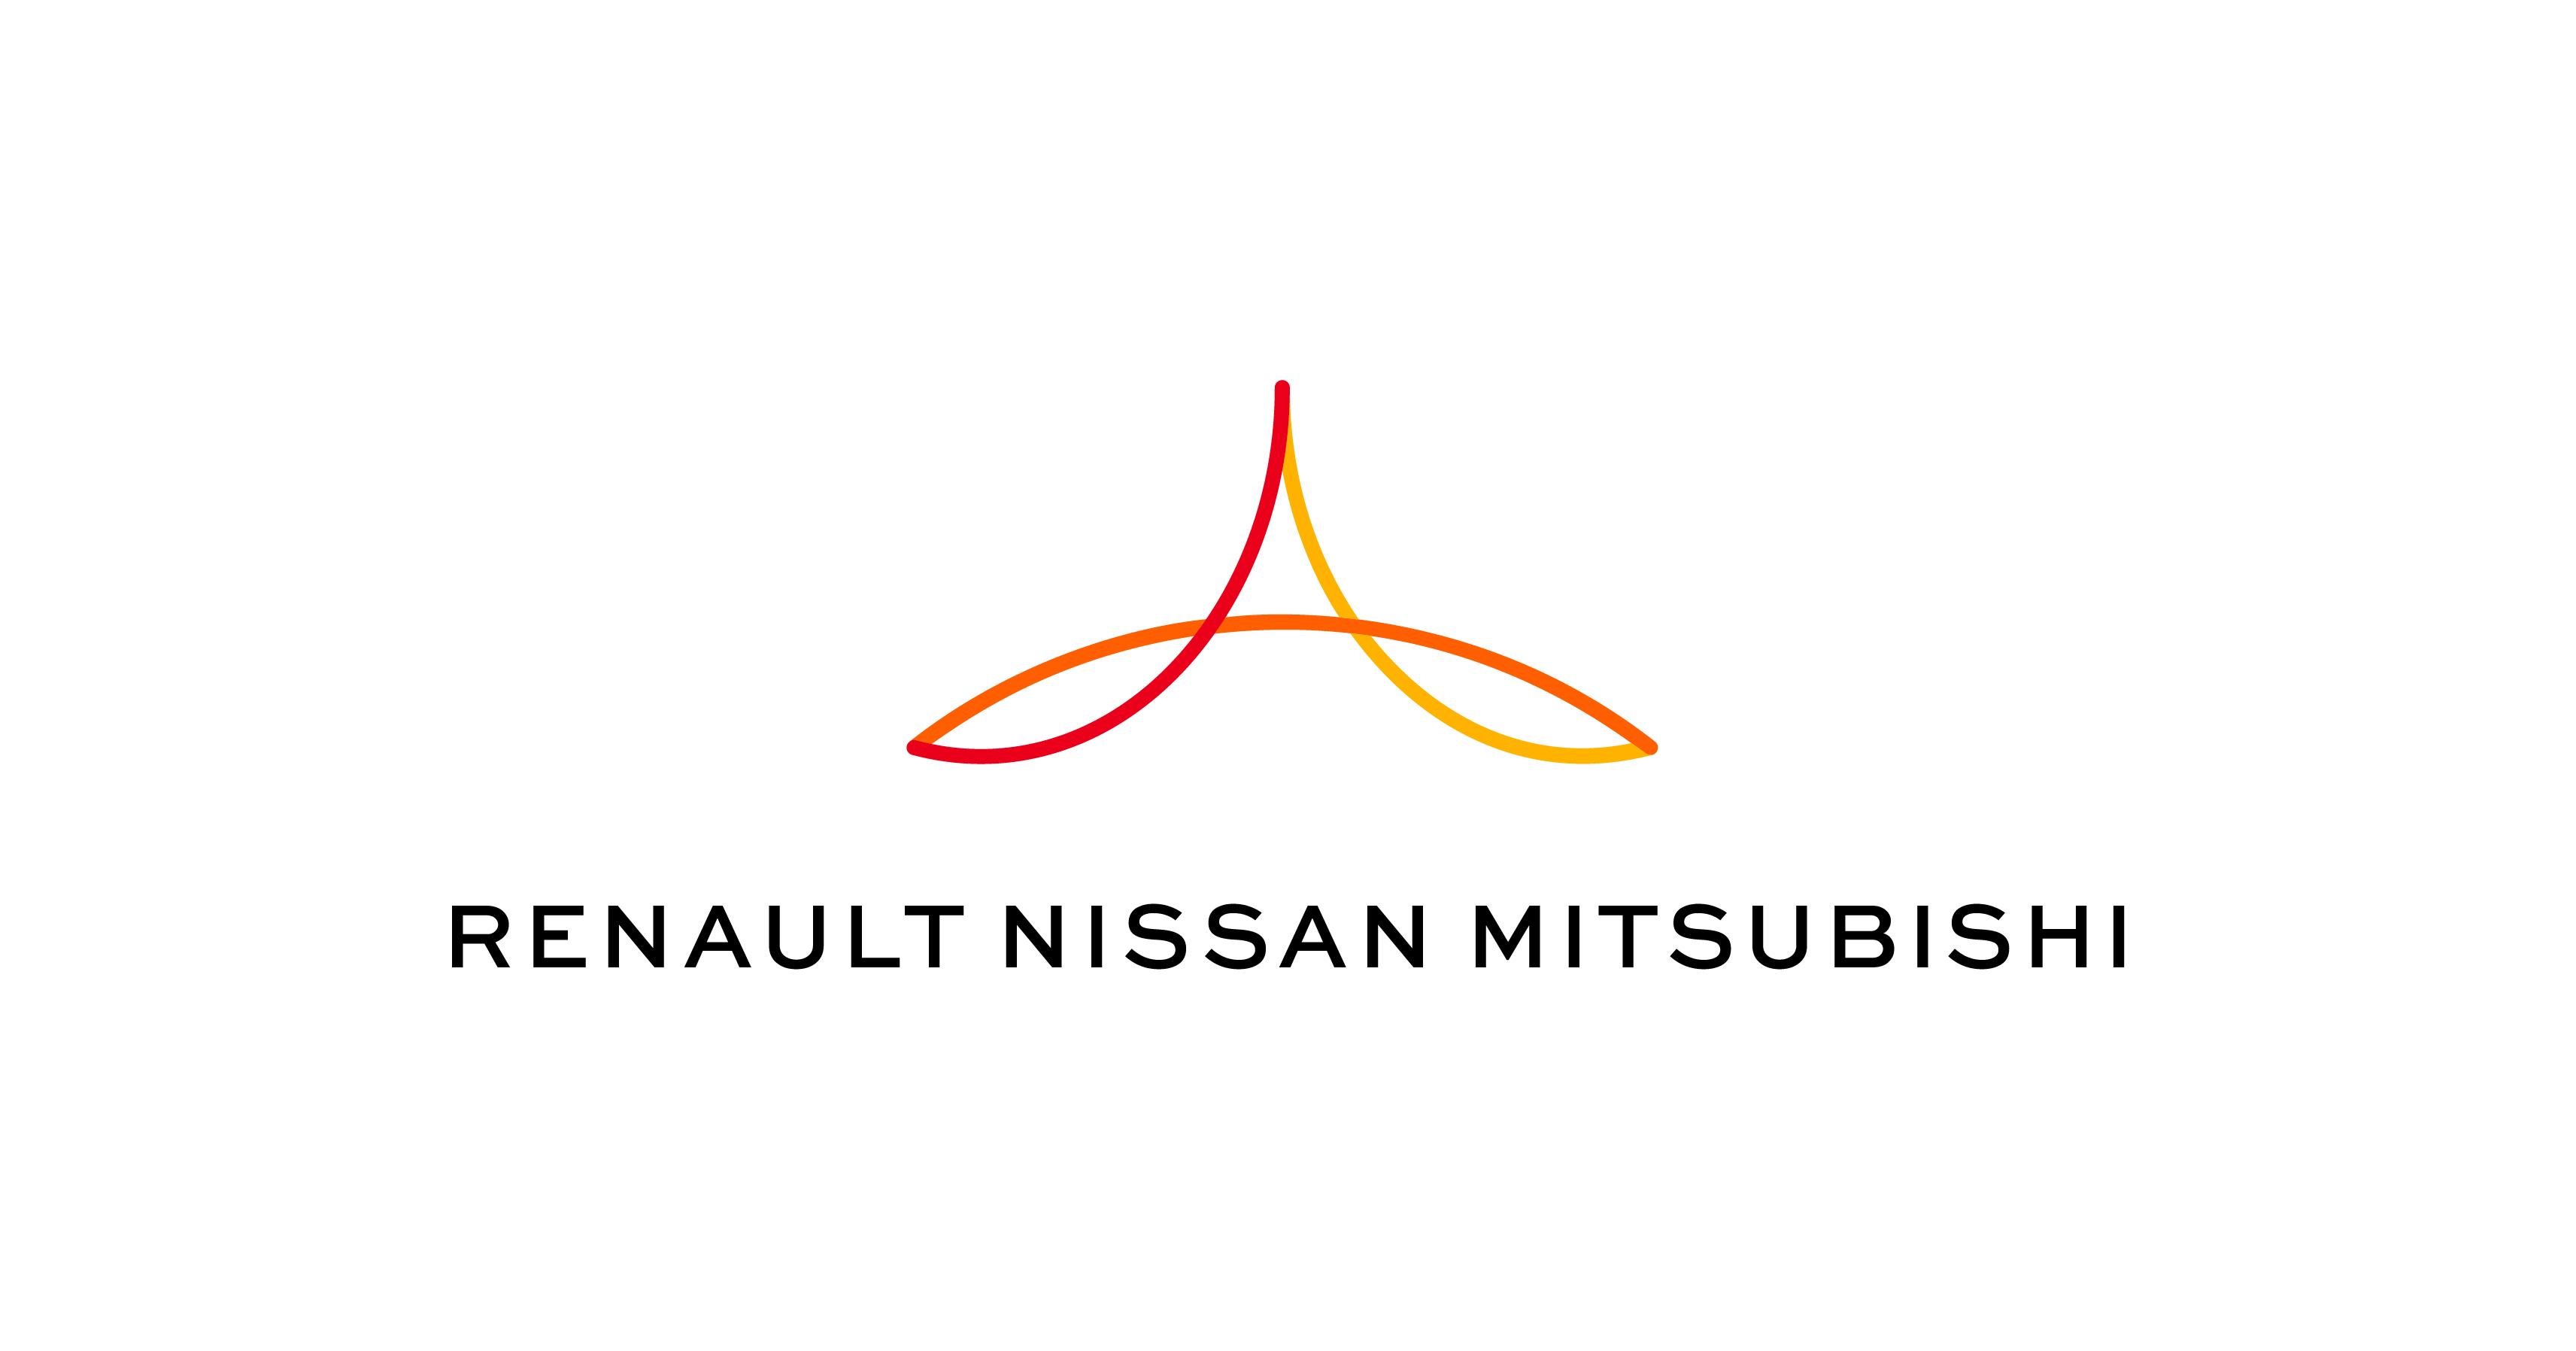 Renault_Nissan_Mitsubishi_Logo